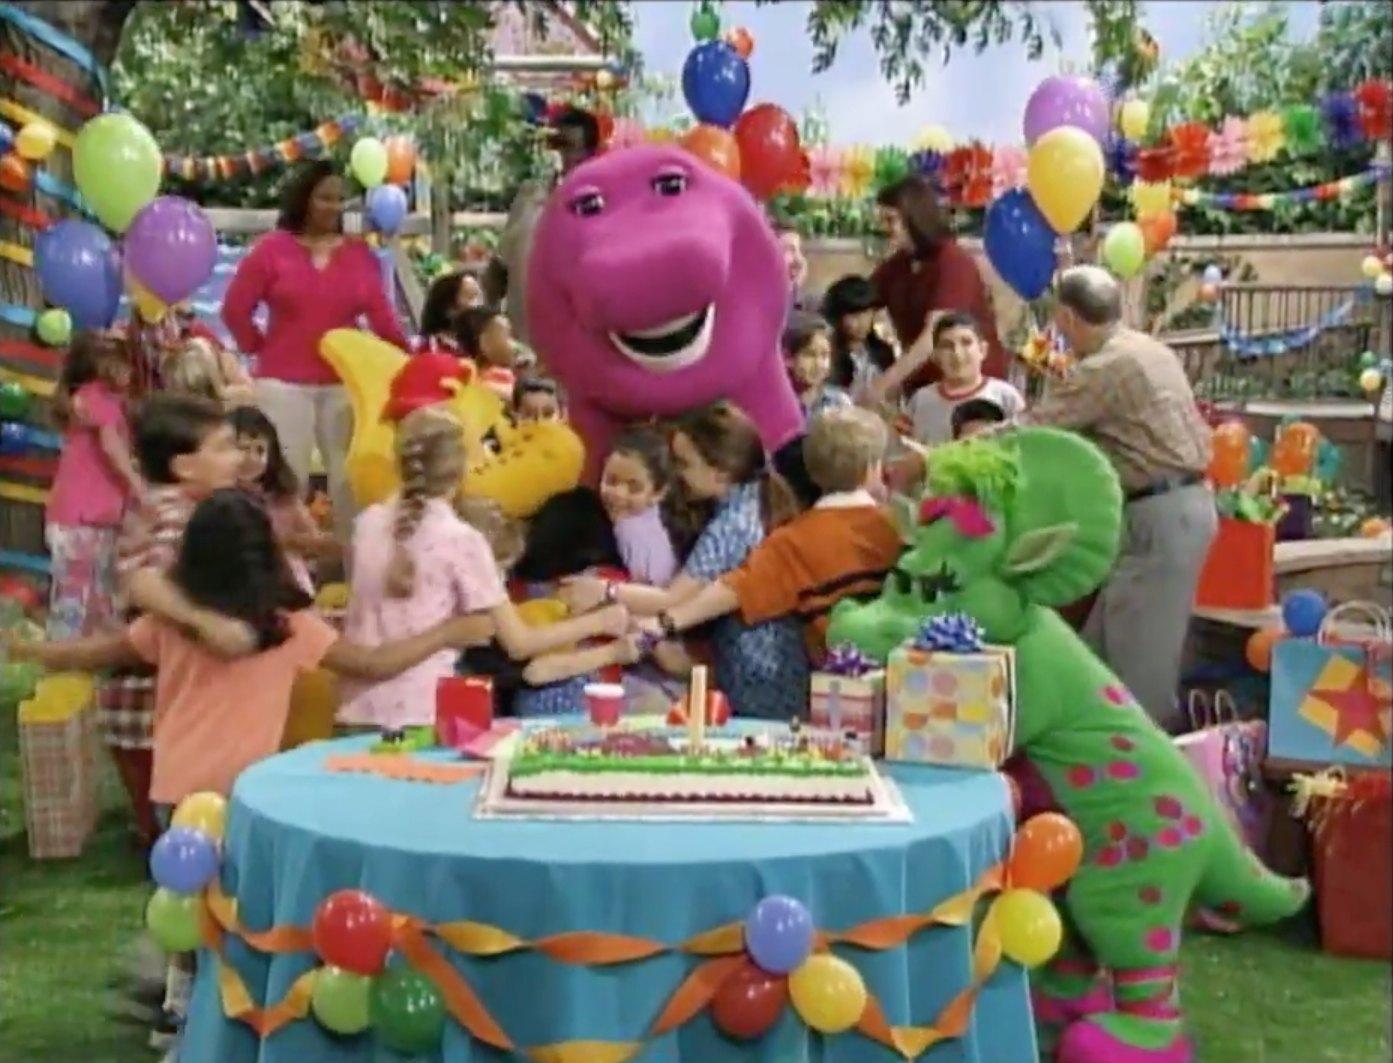 barney birthday It's Your Birthday, Barney!   Barney Wiki   FANDOM powered by Wikia barney birthday